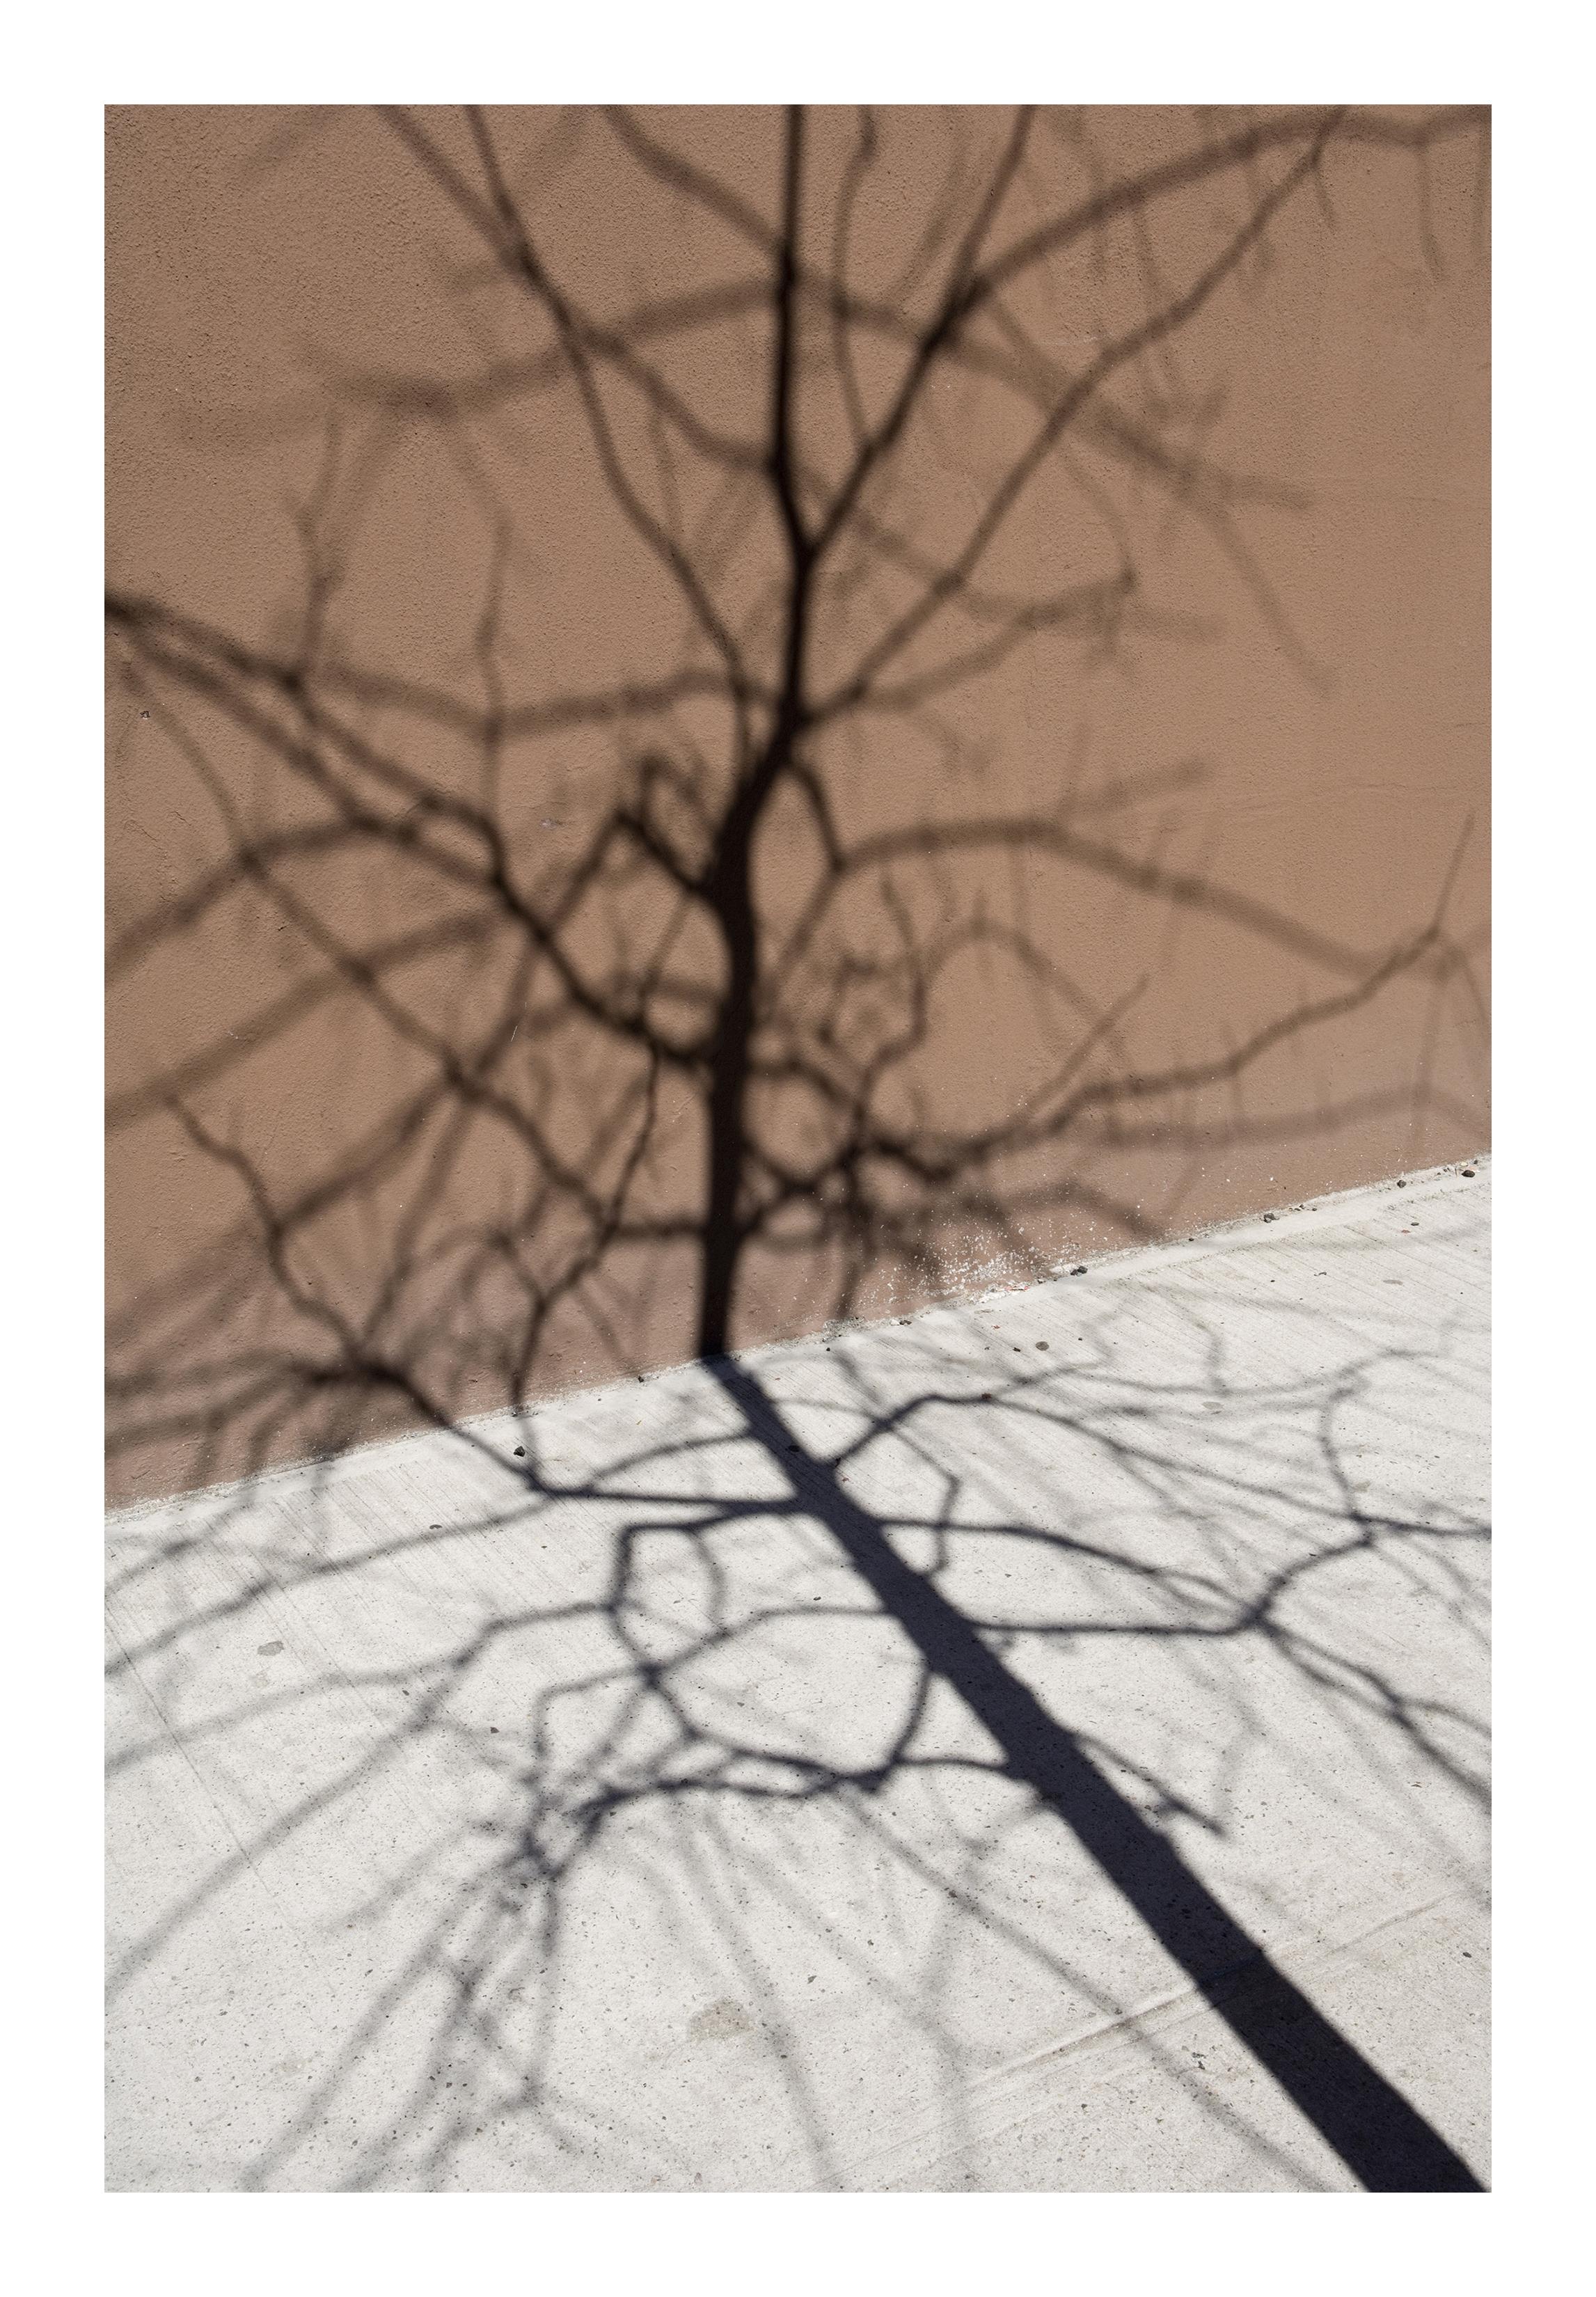 Shadows_003